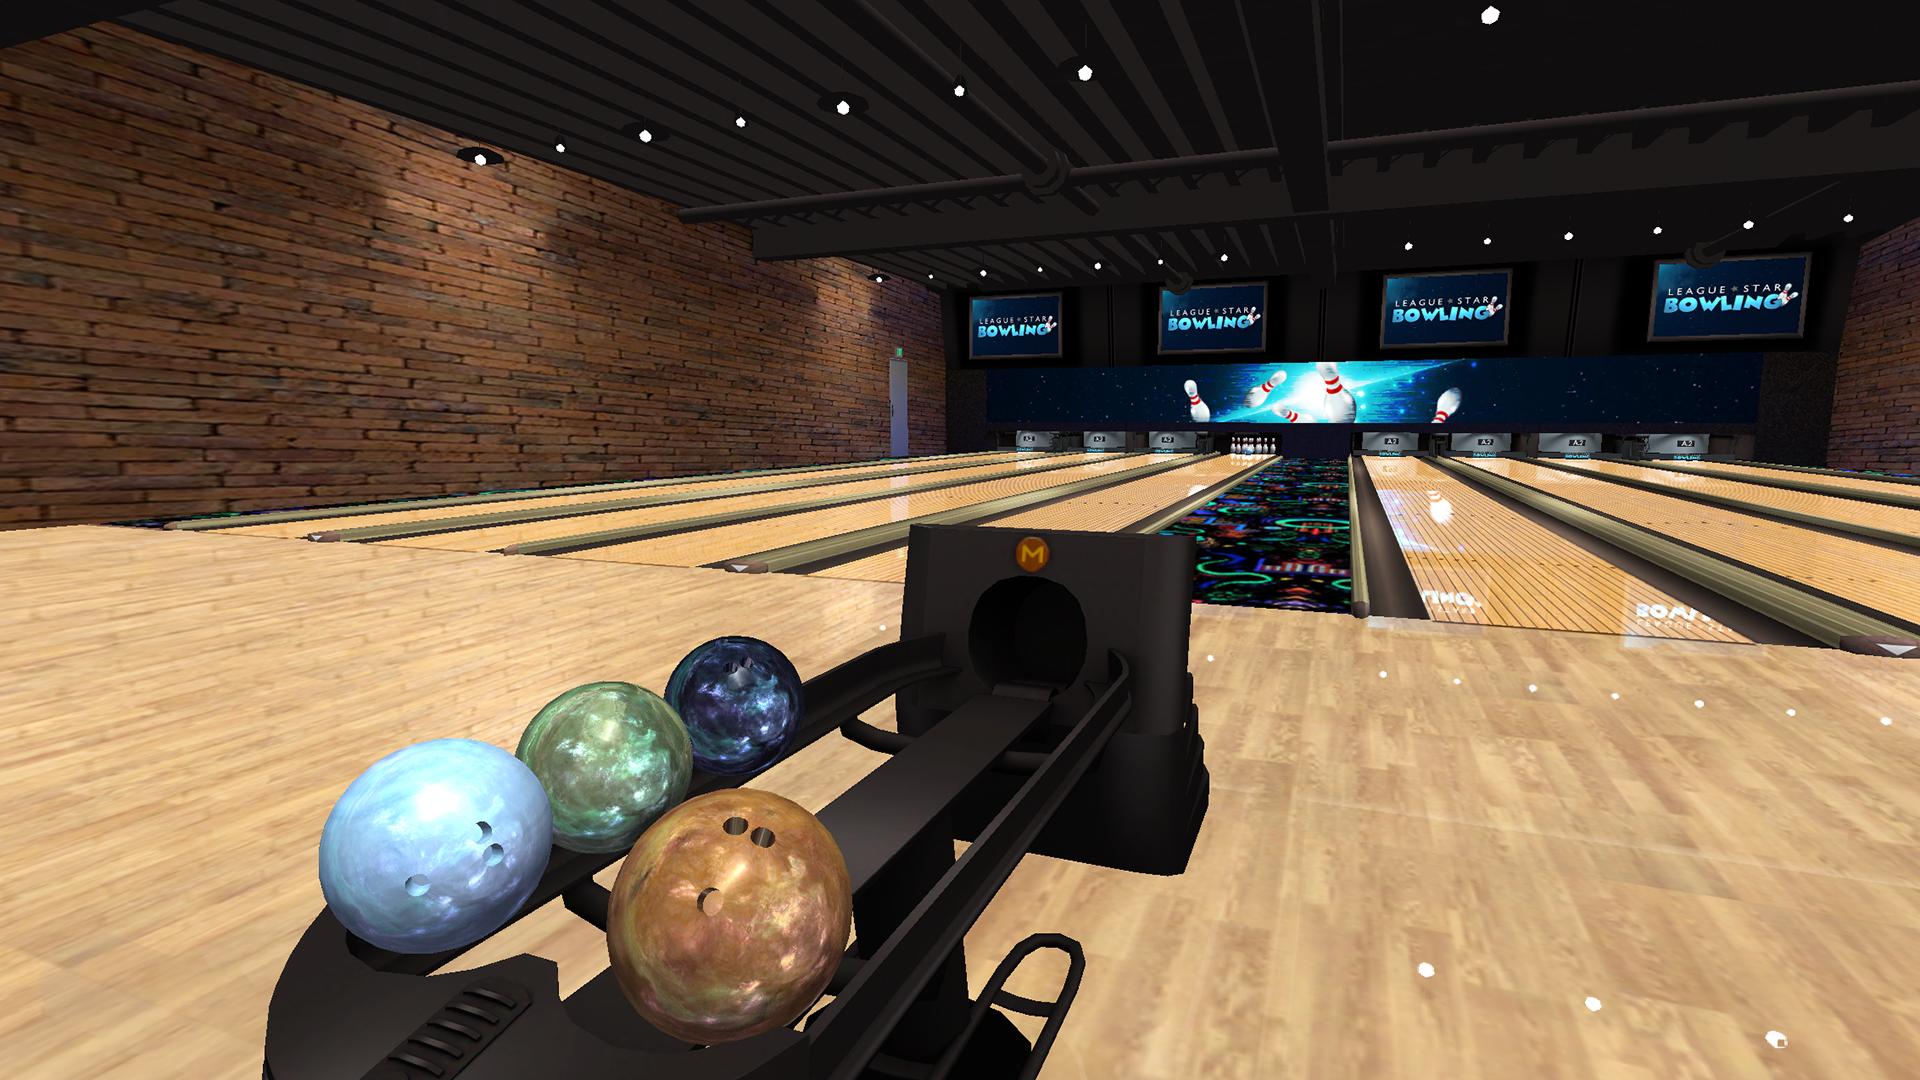 League Star Bowling screenshot 7